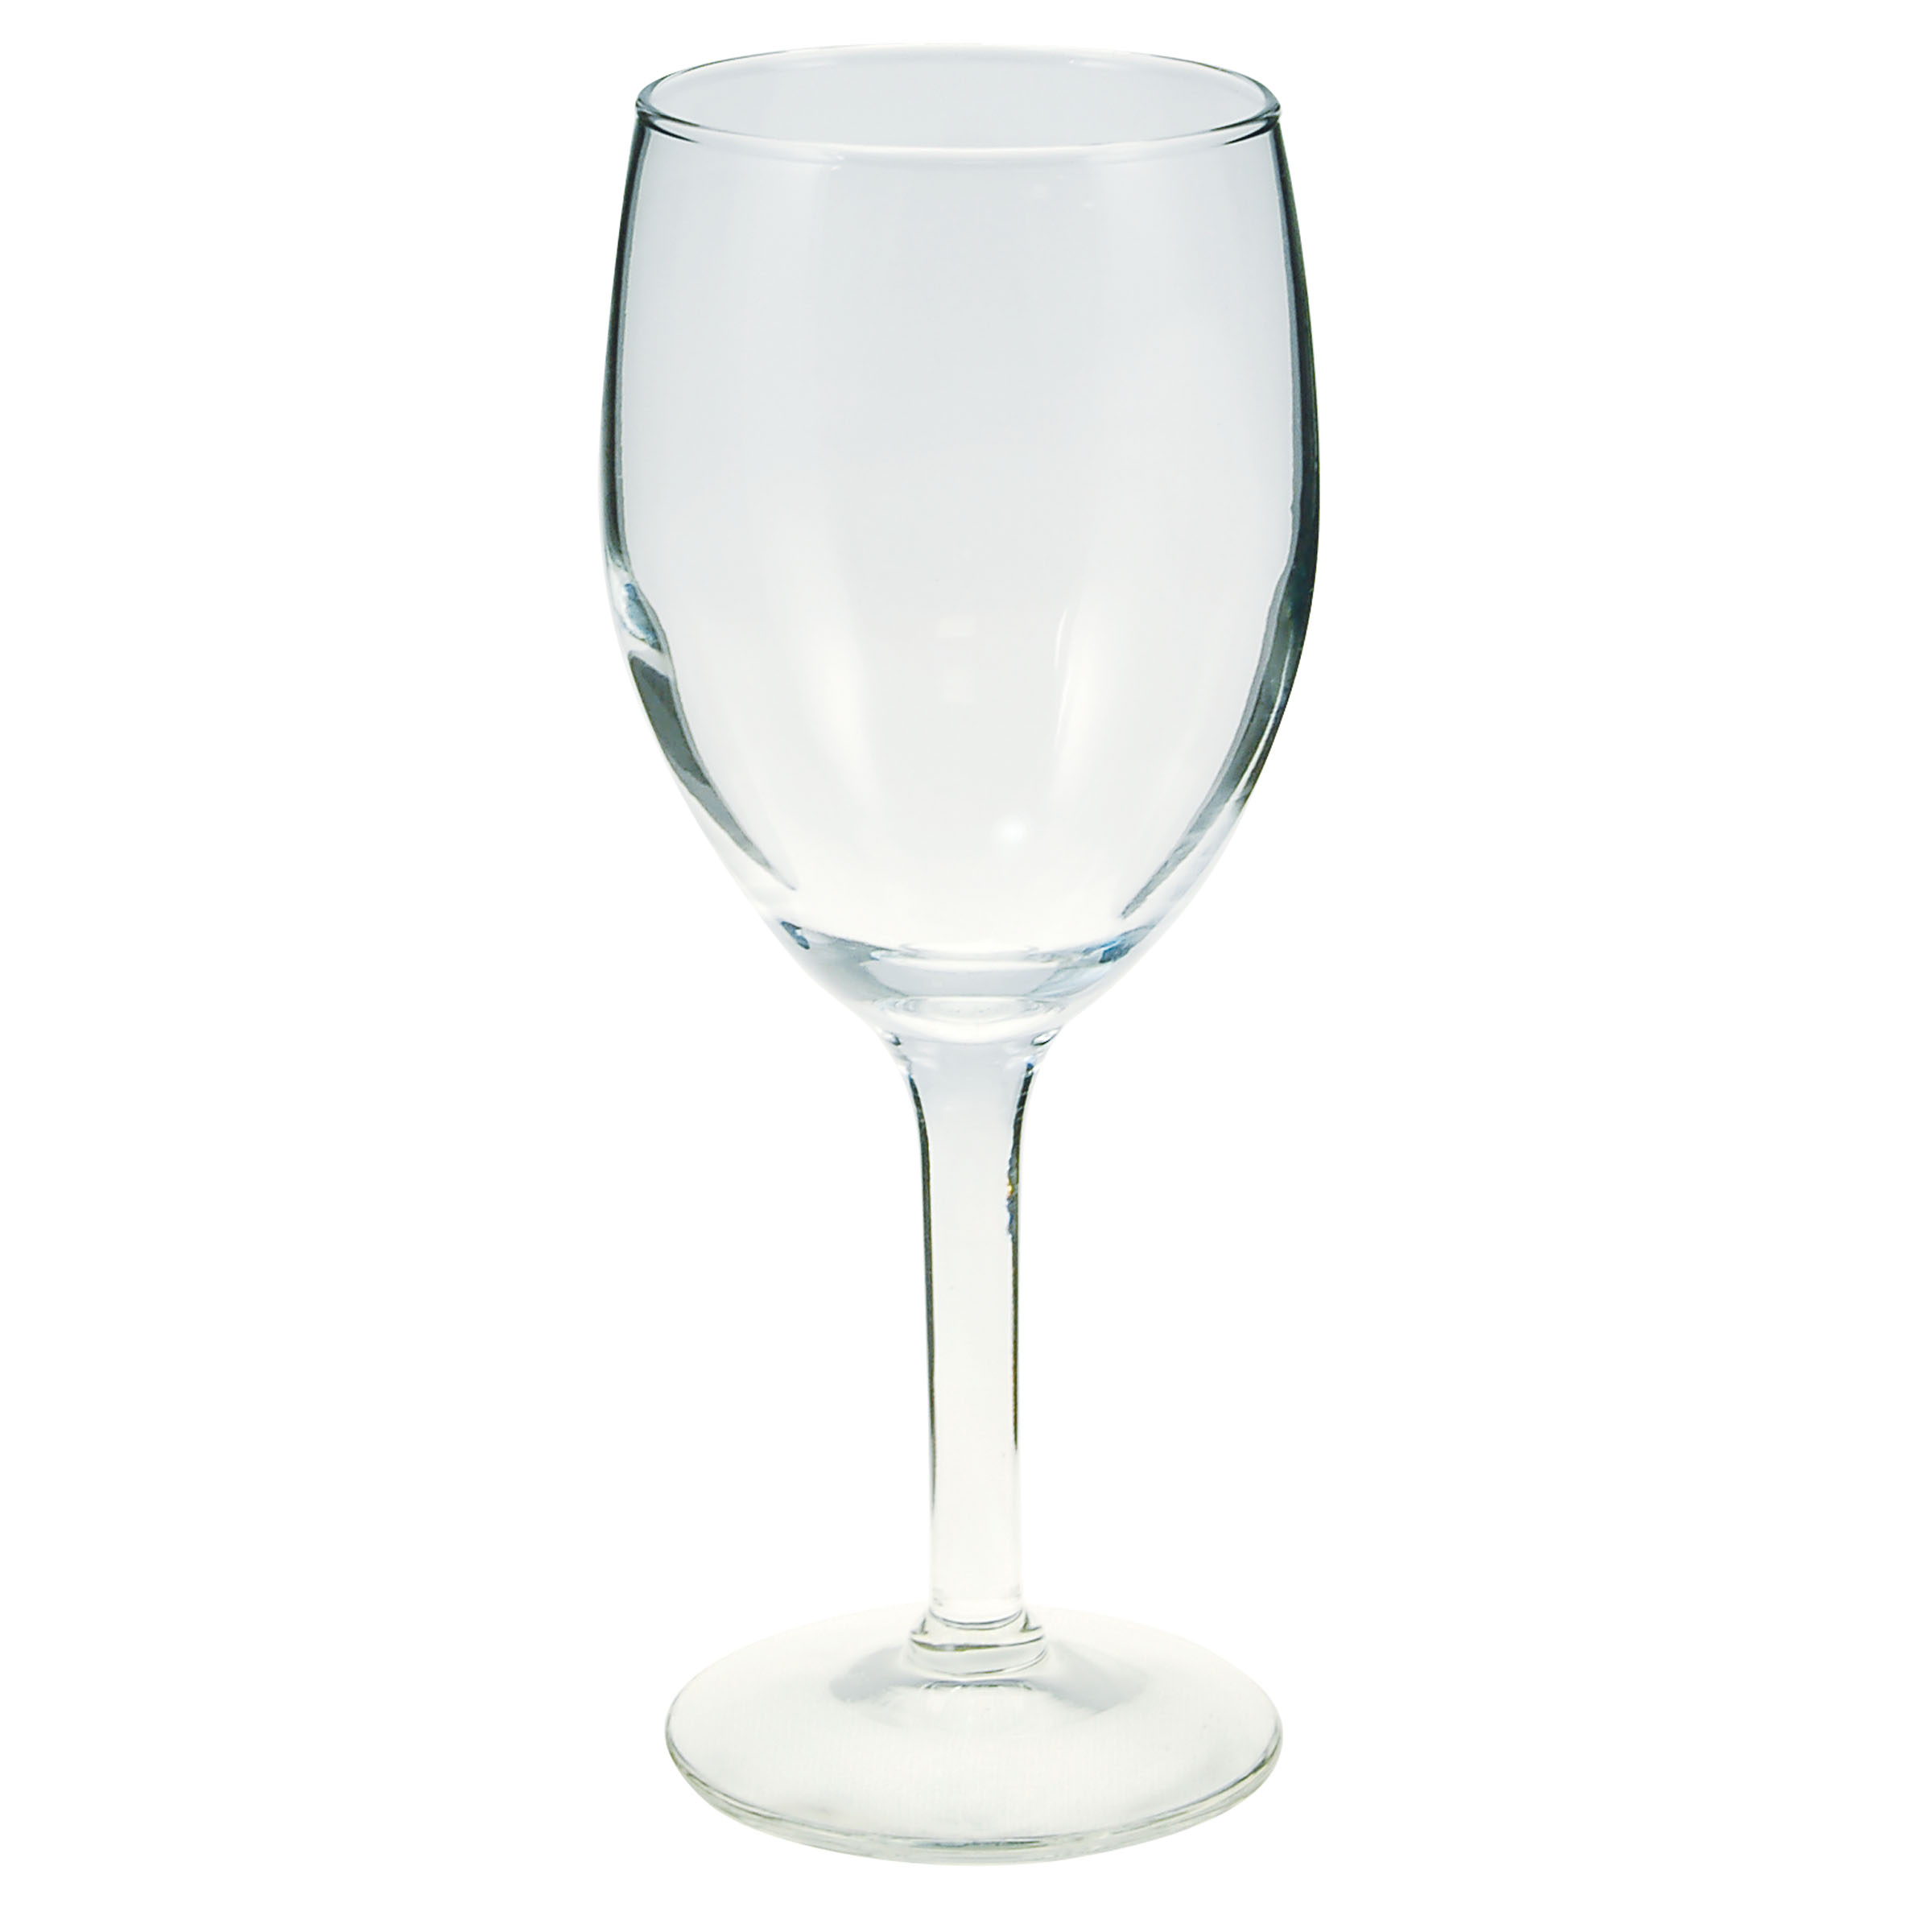 Numo wine glass 8 ounces - Beaker wine glasses ...